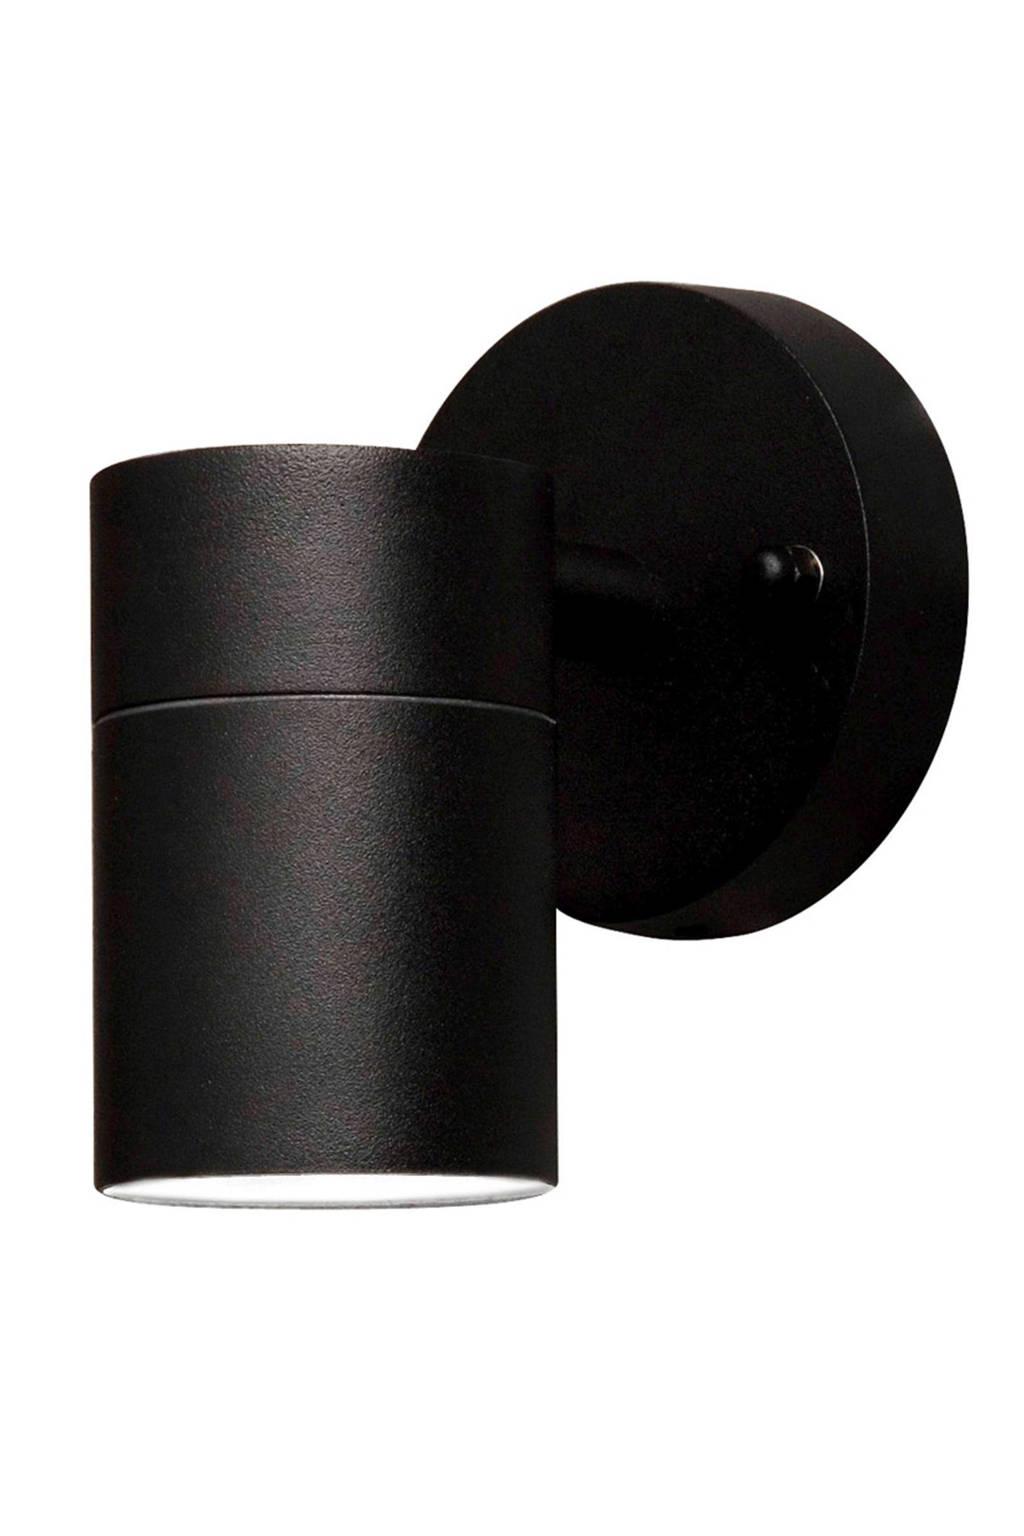 Konstsmide wandlamp, Matzwart, 6x9x9 cm